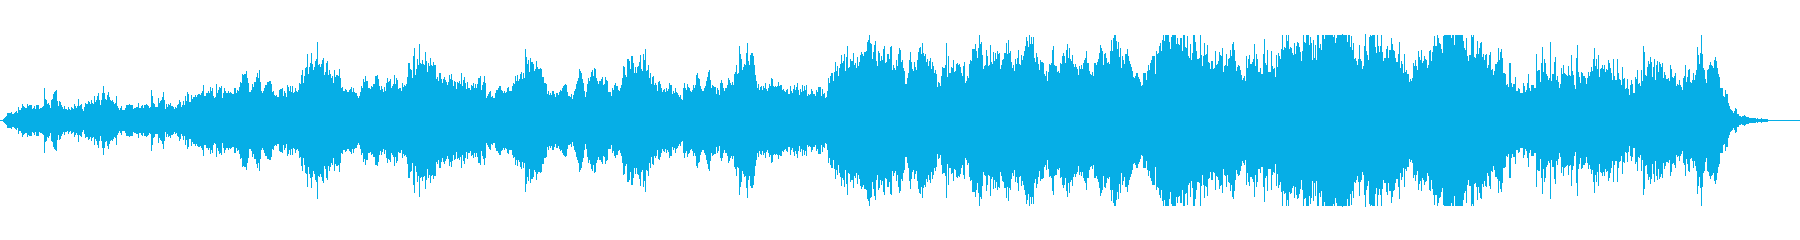 KANTホラー不気味BGM200710の再生済みの波形